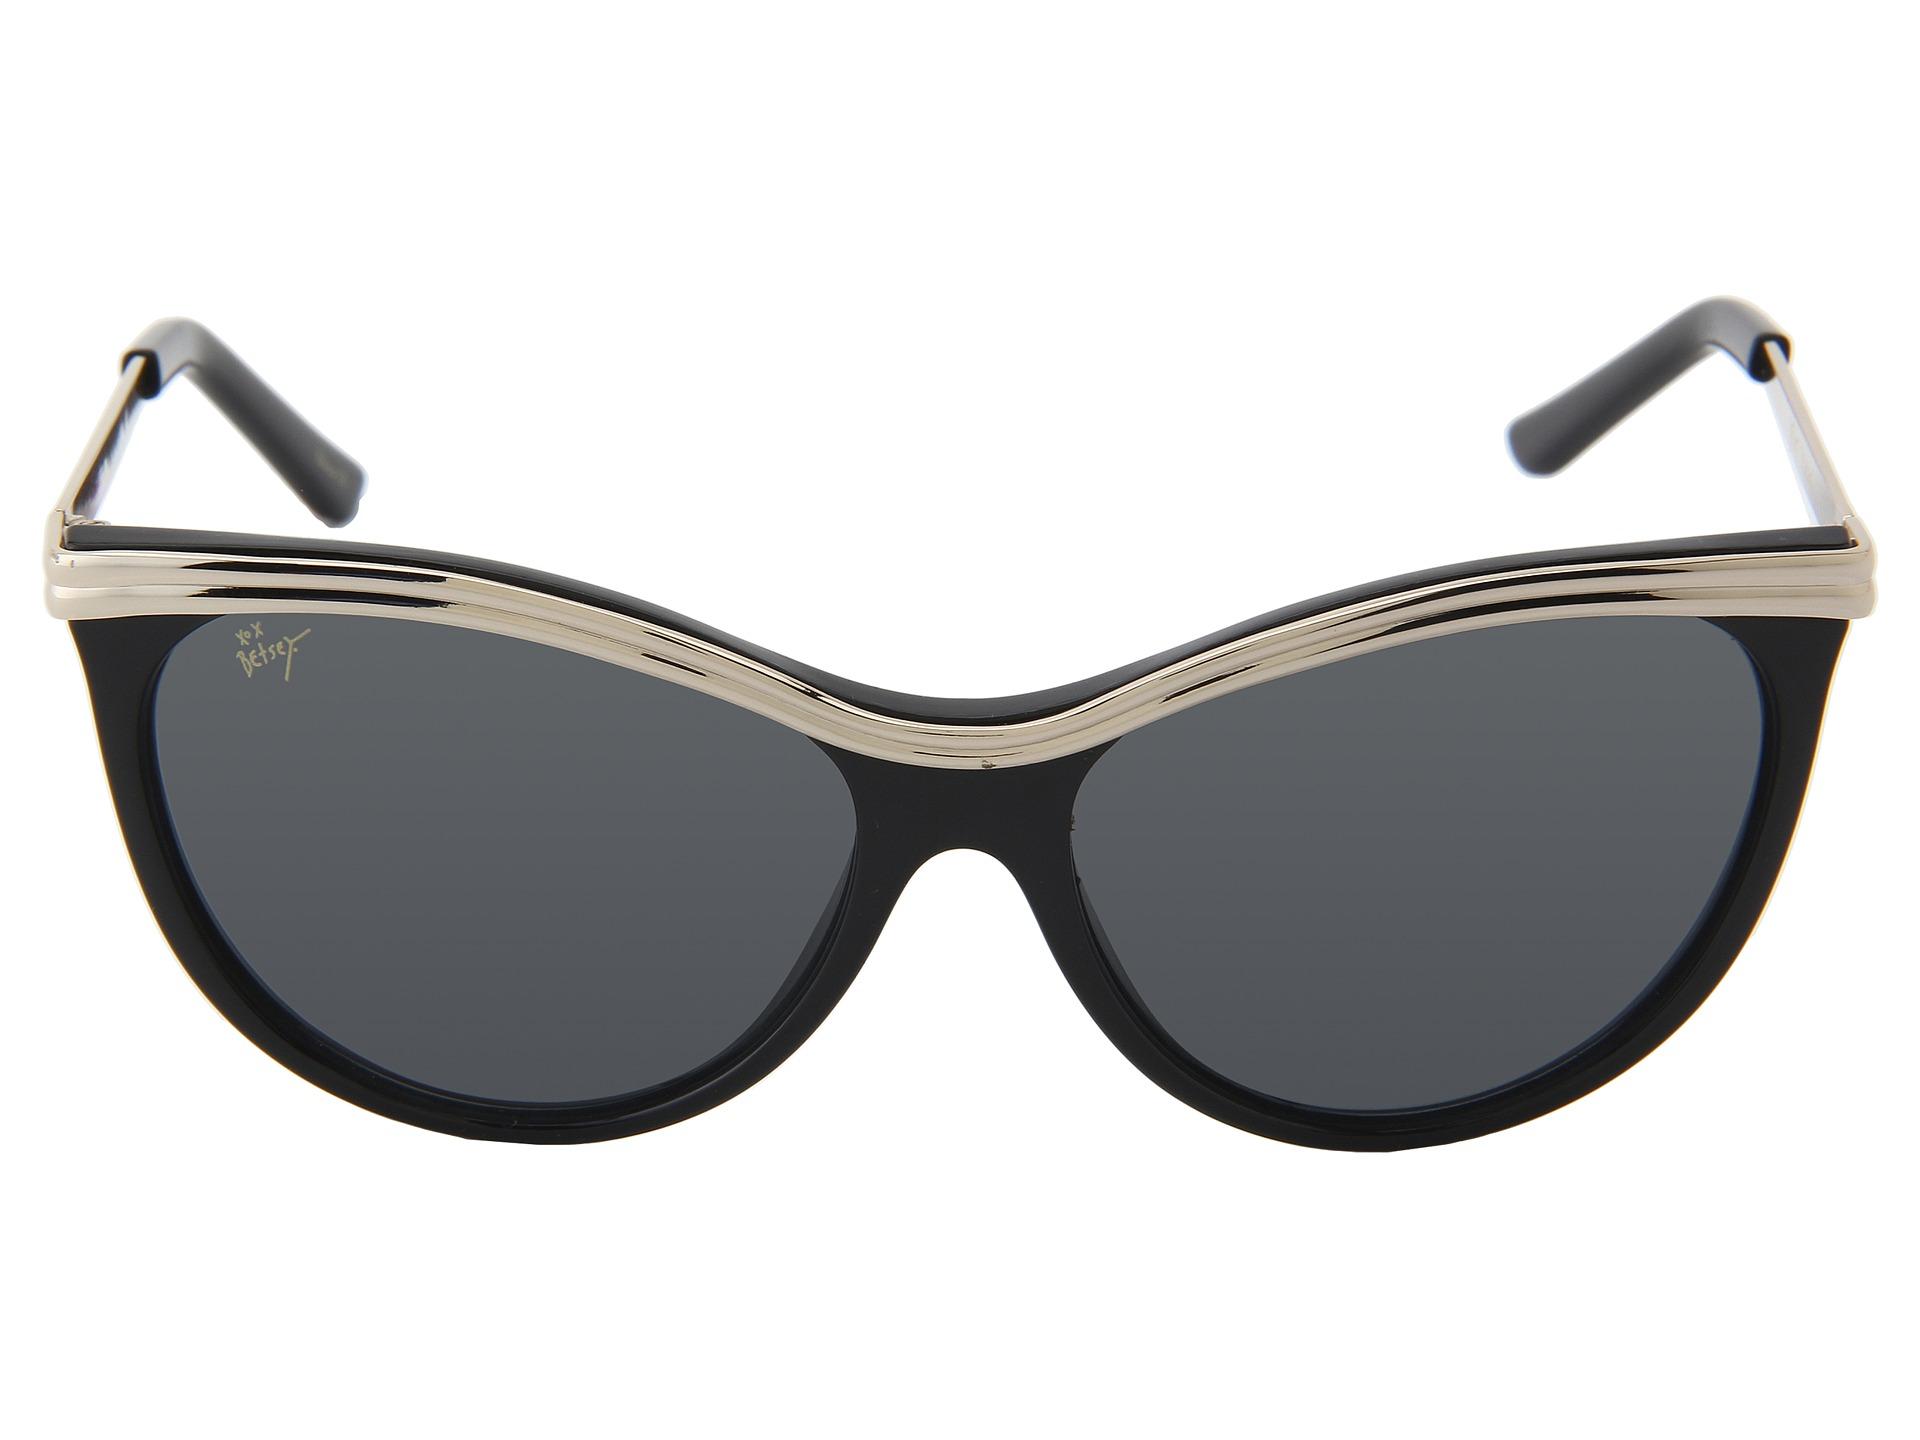 Betsey Johnson Sunglasses Groupon Goods | www.tapdance.org